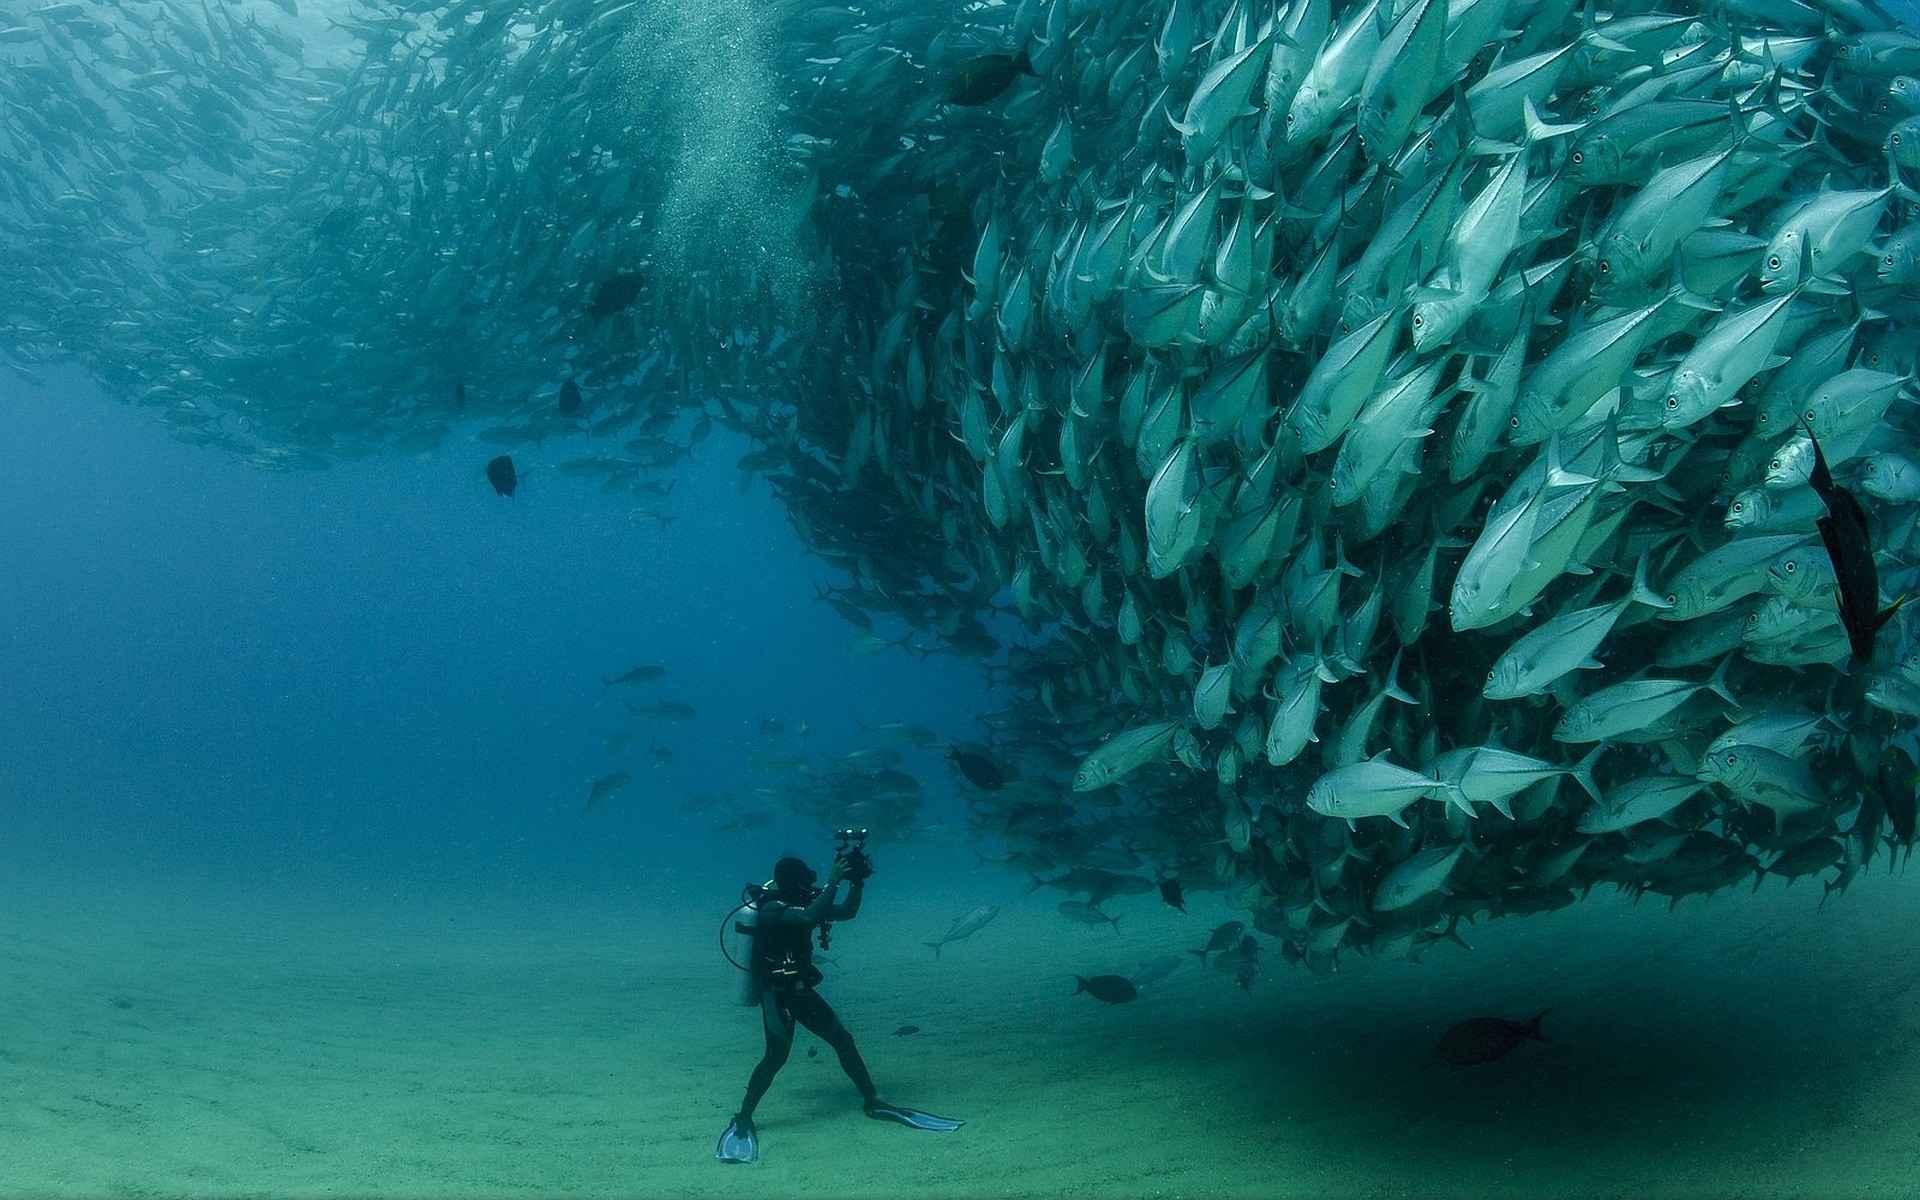 Fish Wallpaper 056